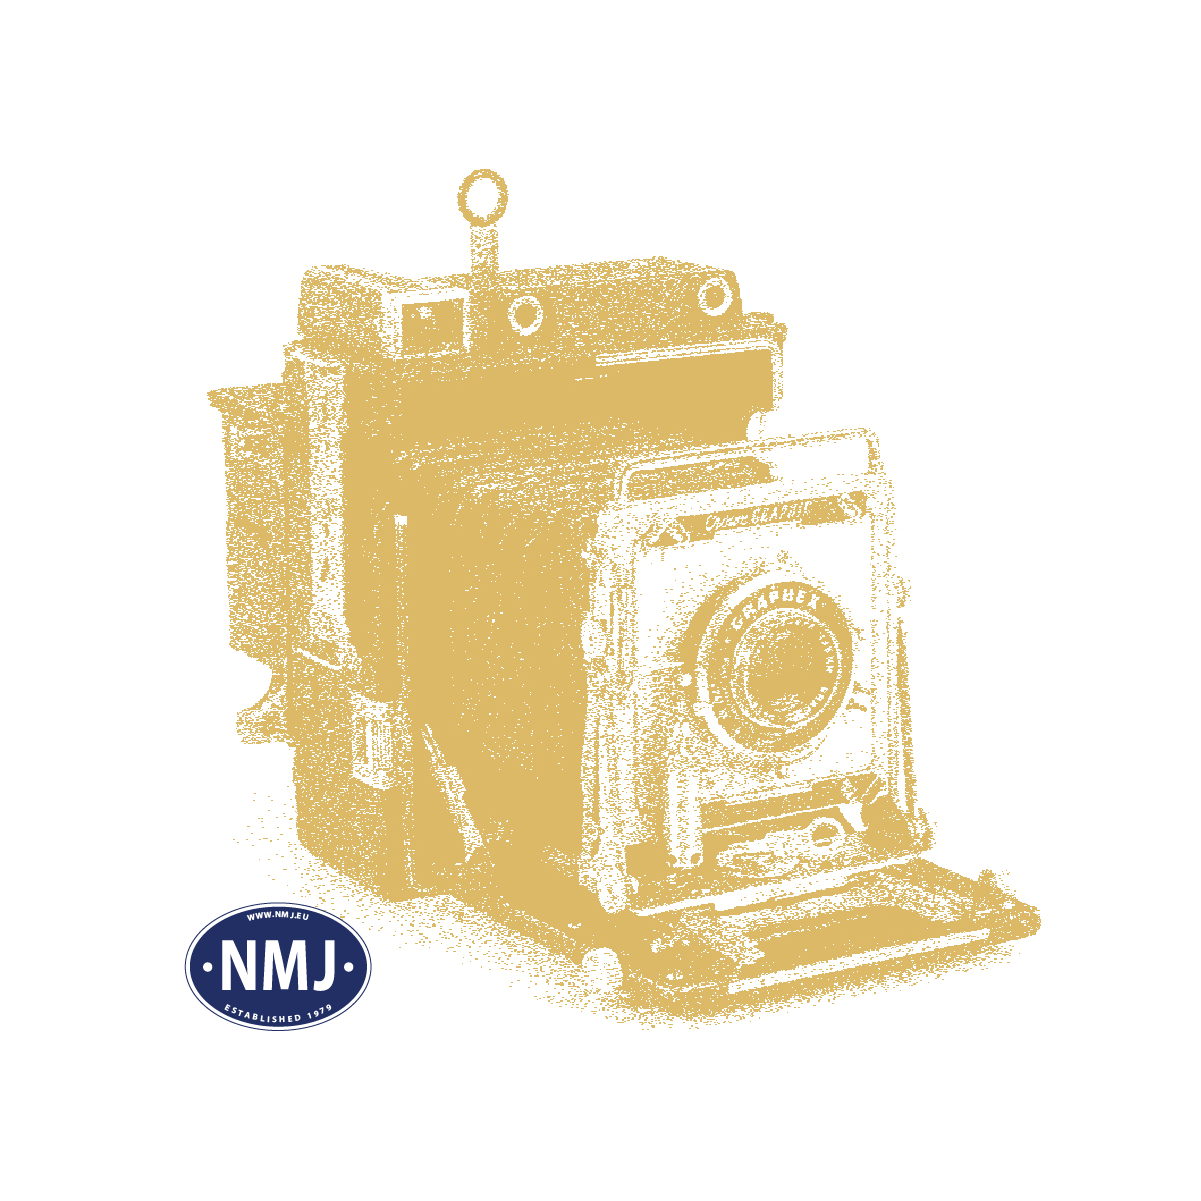 MBR55-1019 - Gressmatte #19, 30 x 40 Cm